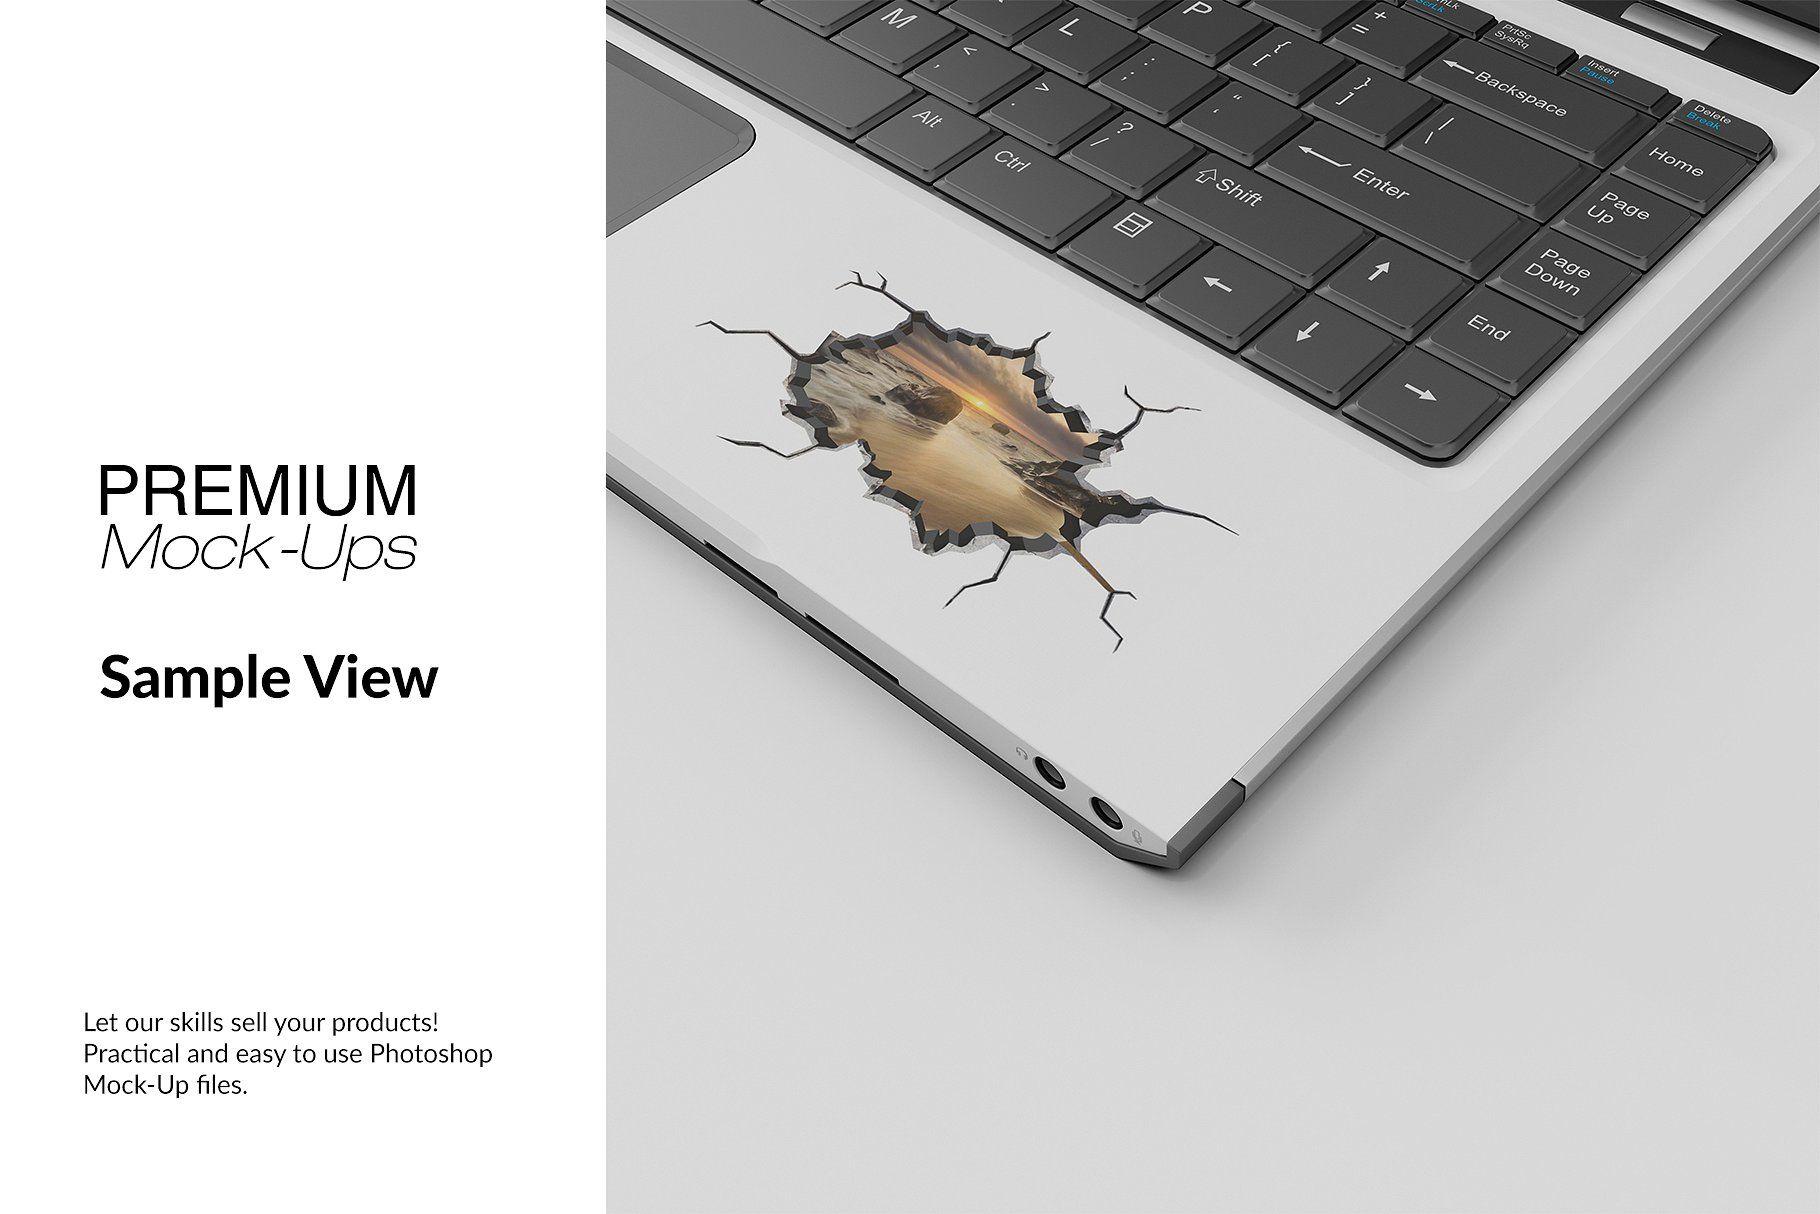 Laptop sticker mockup viewsobjectsresolutionsmart laptop stickers print design